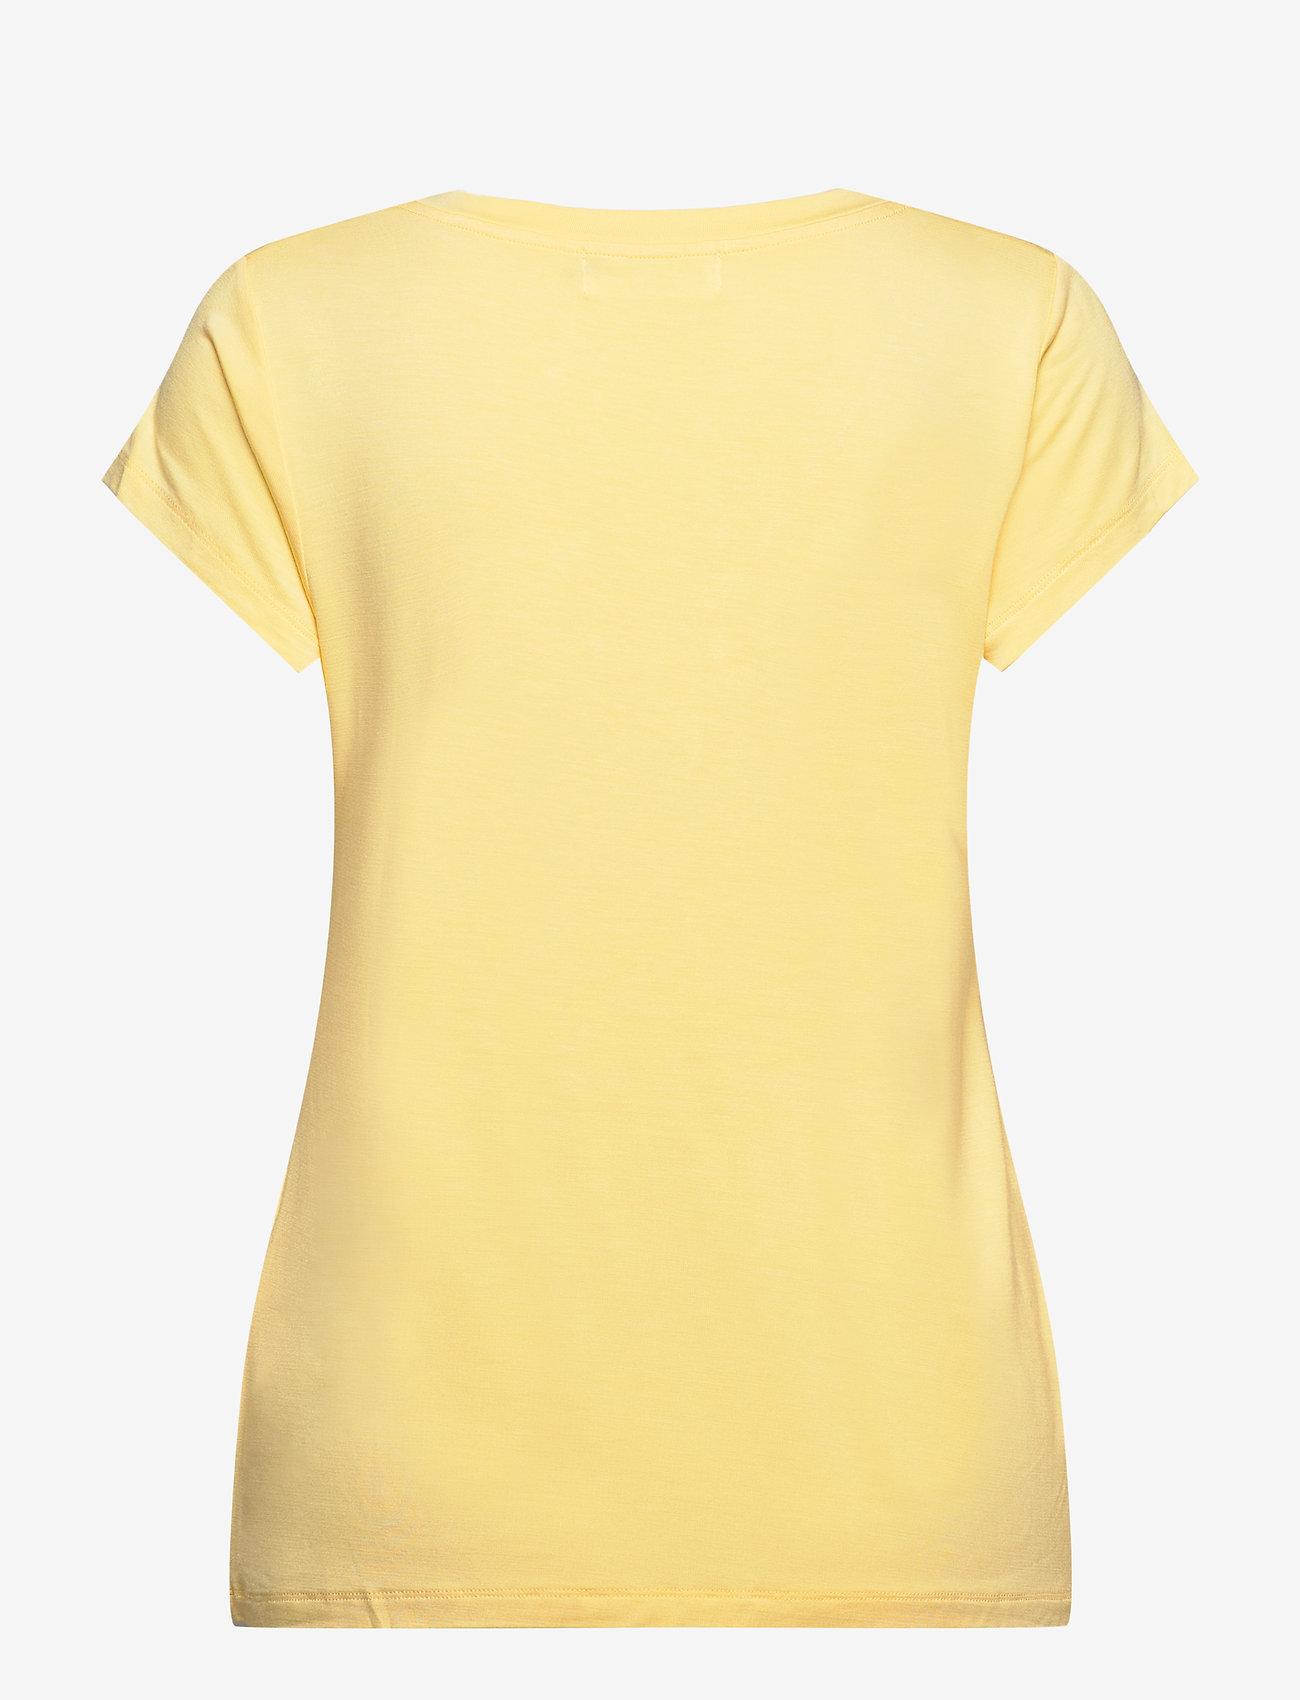 Rosemunde - T-shirt ss - t-shirts - vanilla yellow - 1